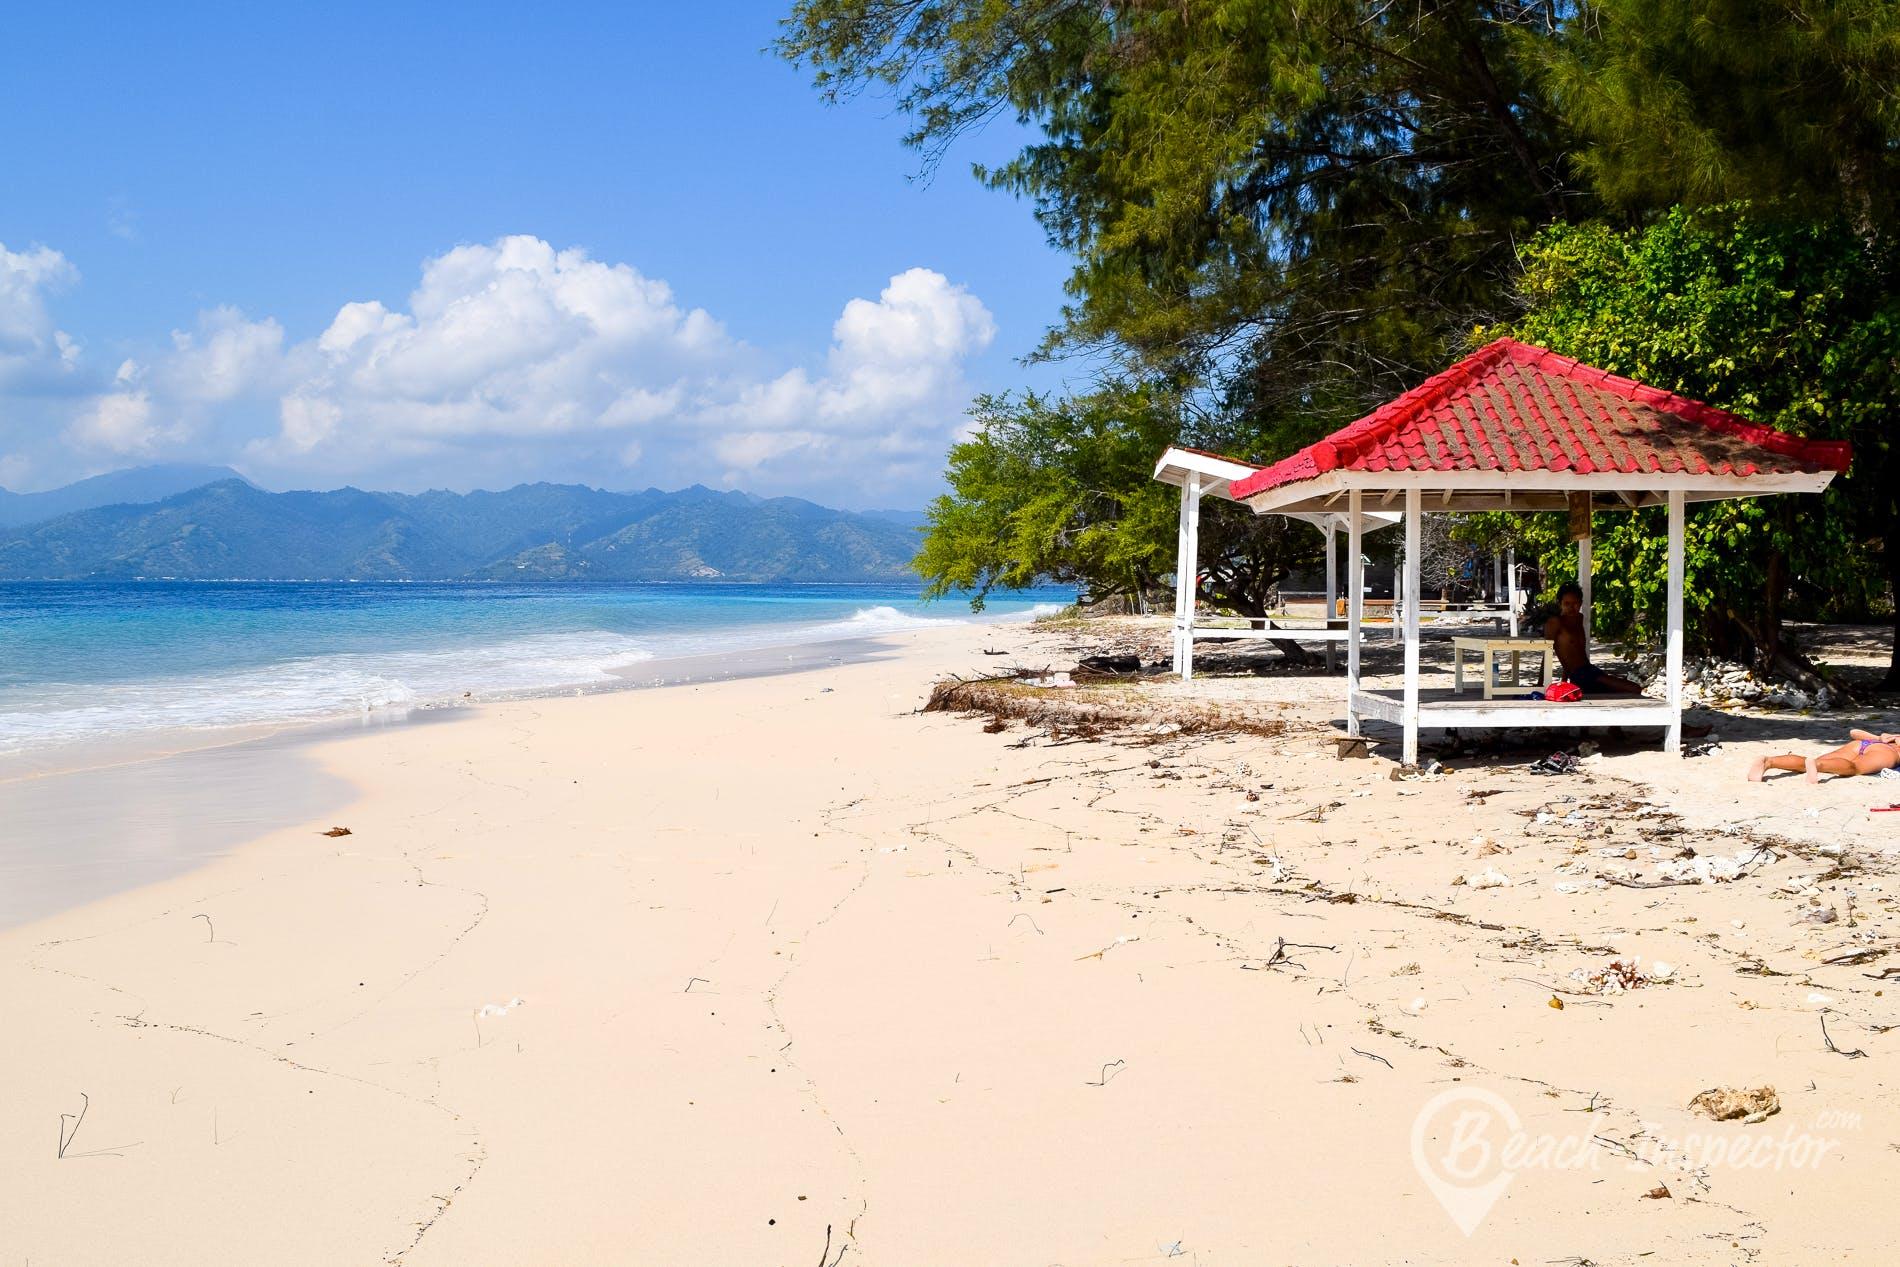 Strand Gili Meno, Gili Meno, Indonesien